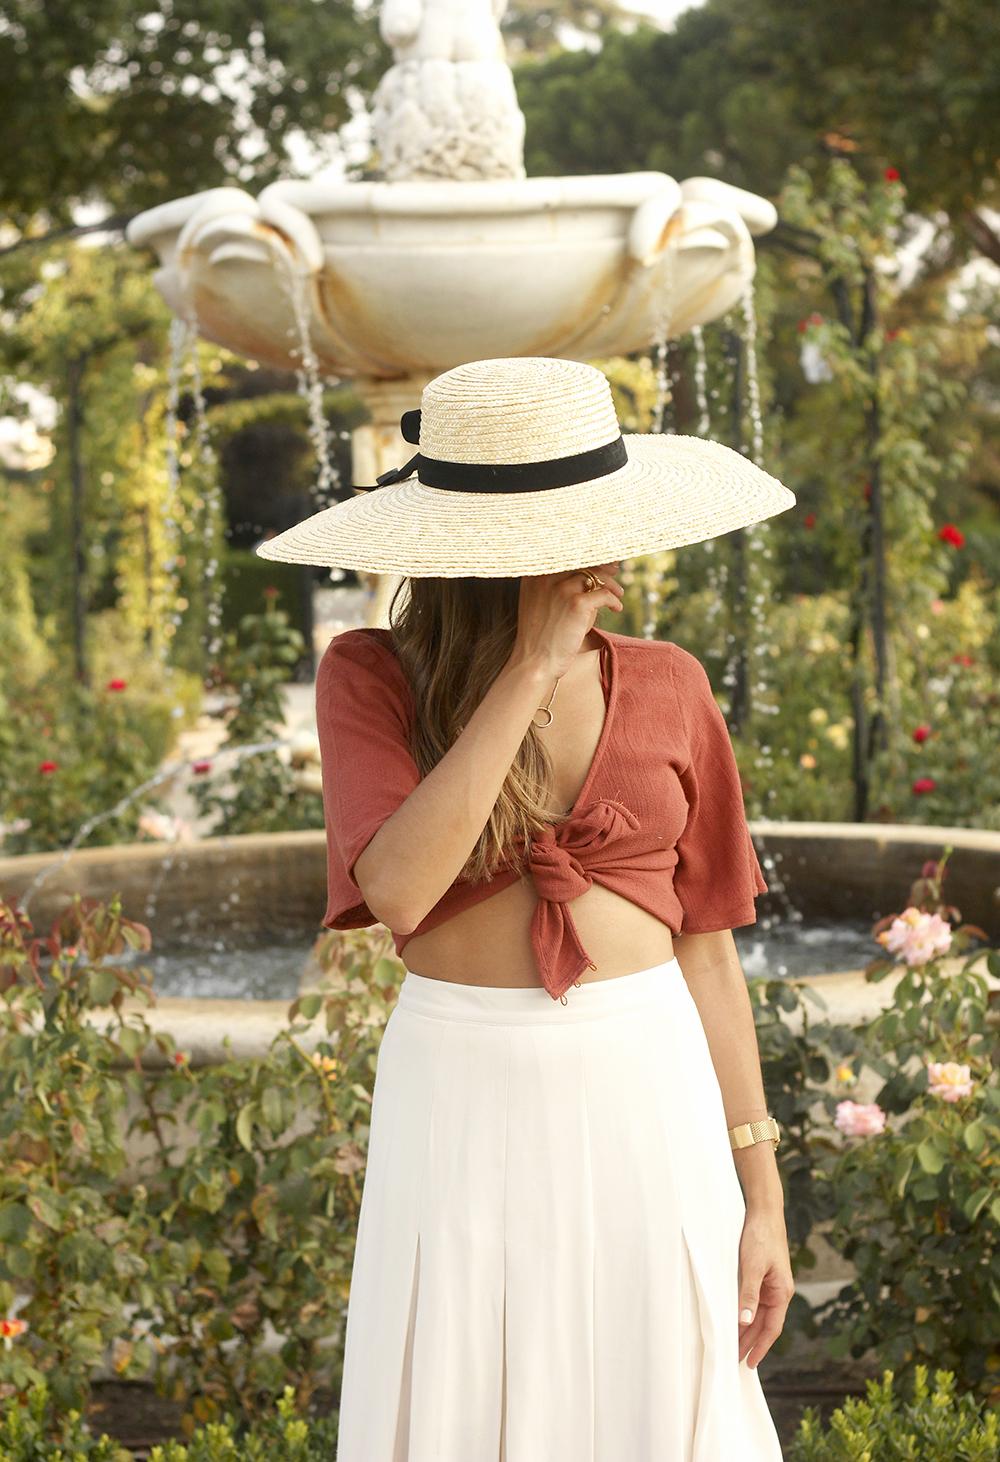 terracotta top white midi skirt straw hat flat sandals street style 201812